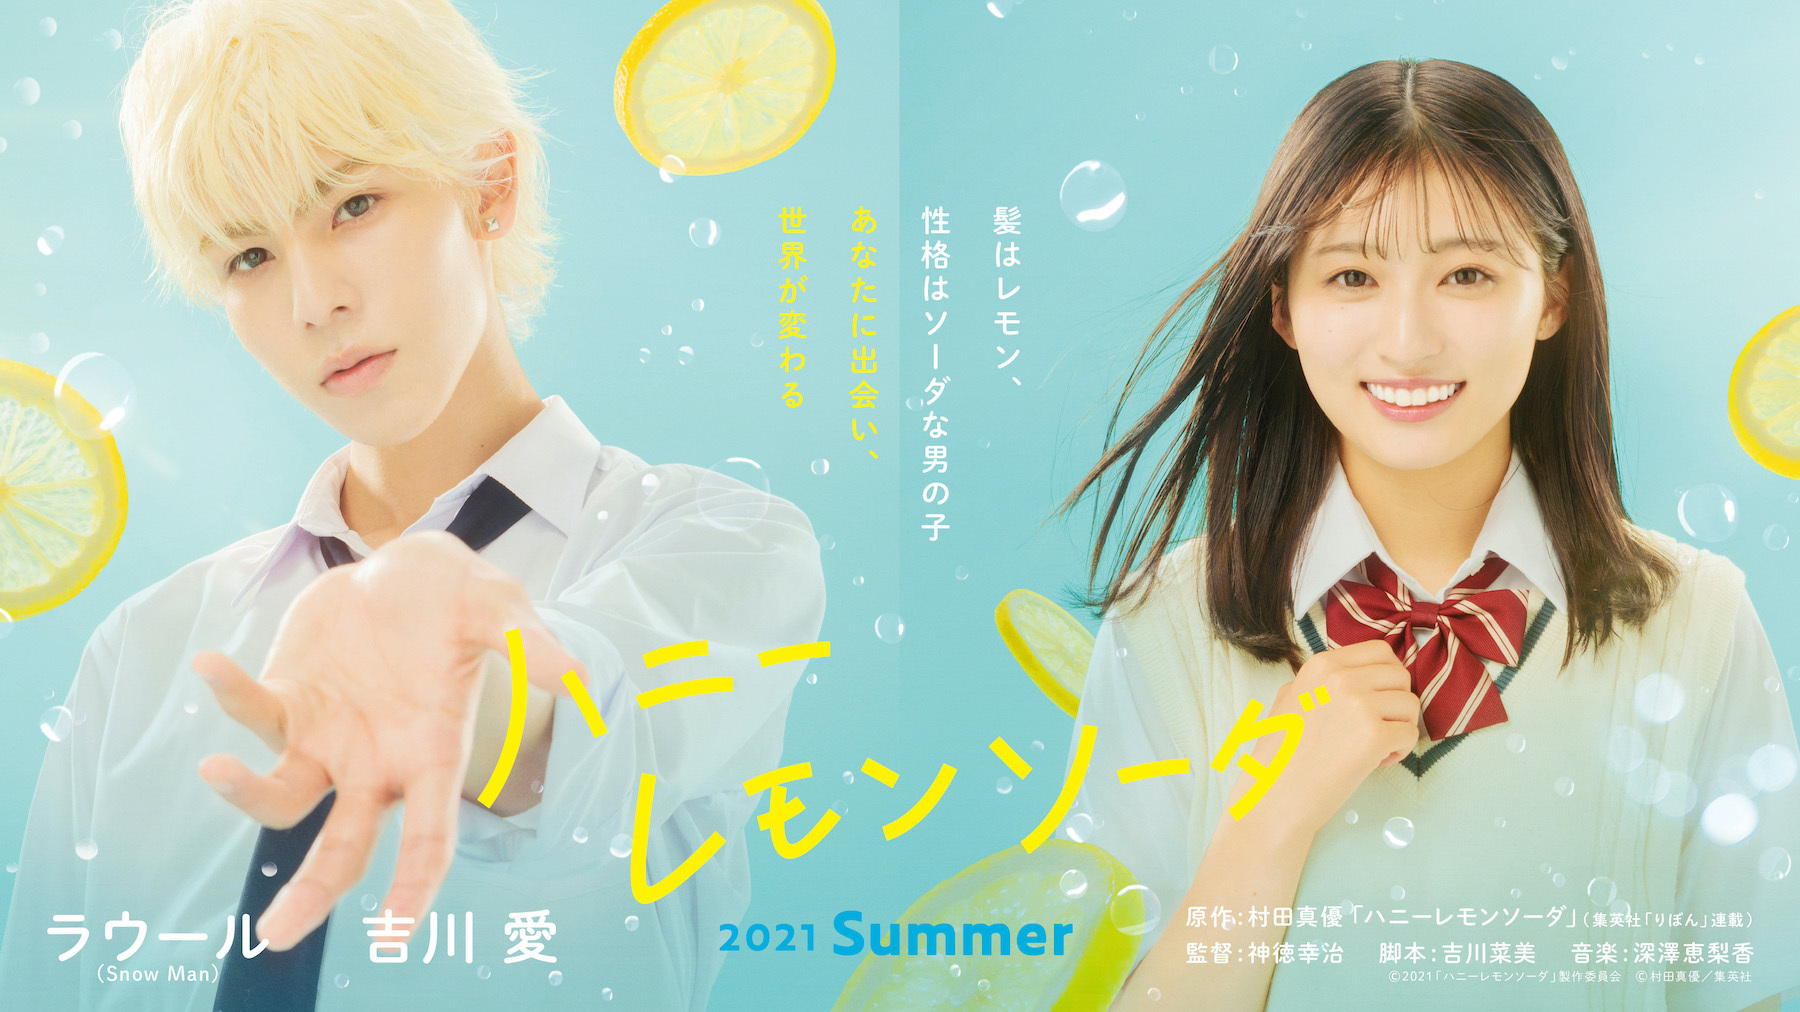 (C) 2021「ハニーレモンソーダ」製作委員会(C)村田真優/集英社